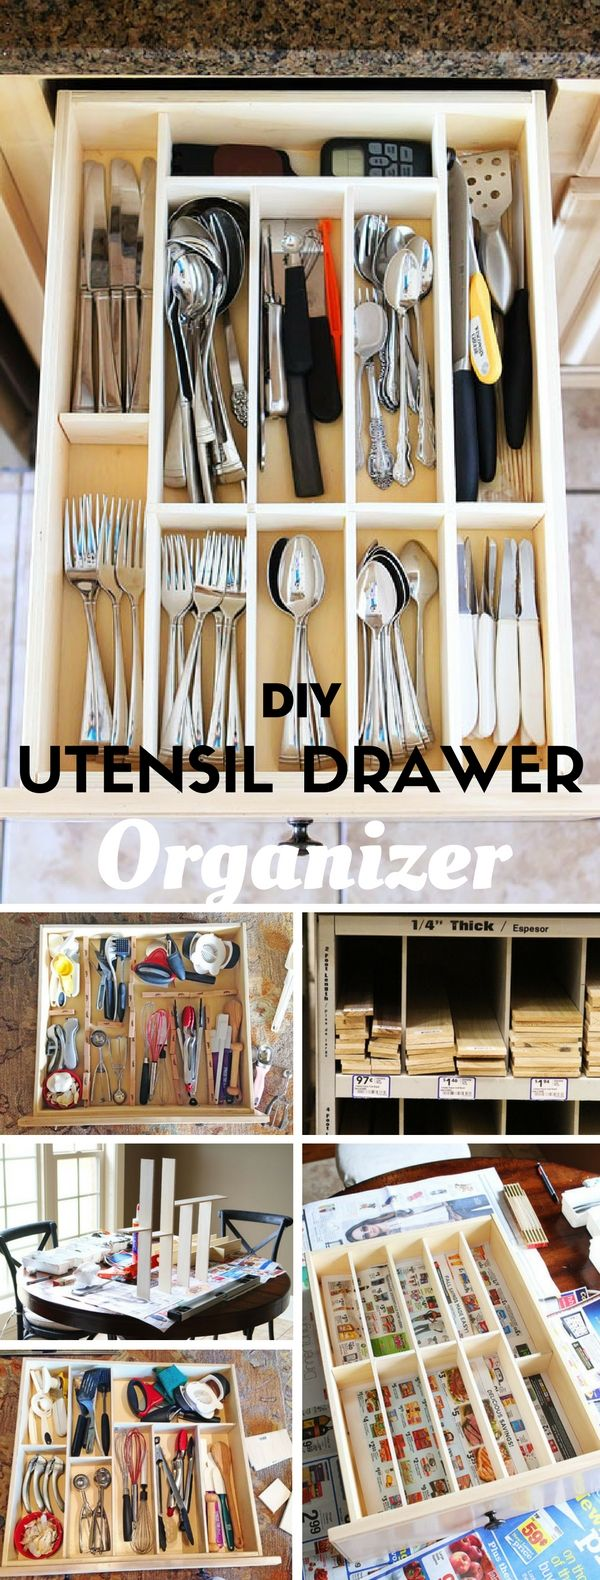 best organization images on pinterest organization ideas home